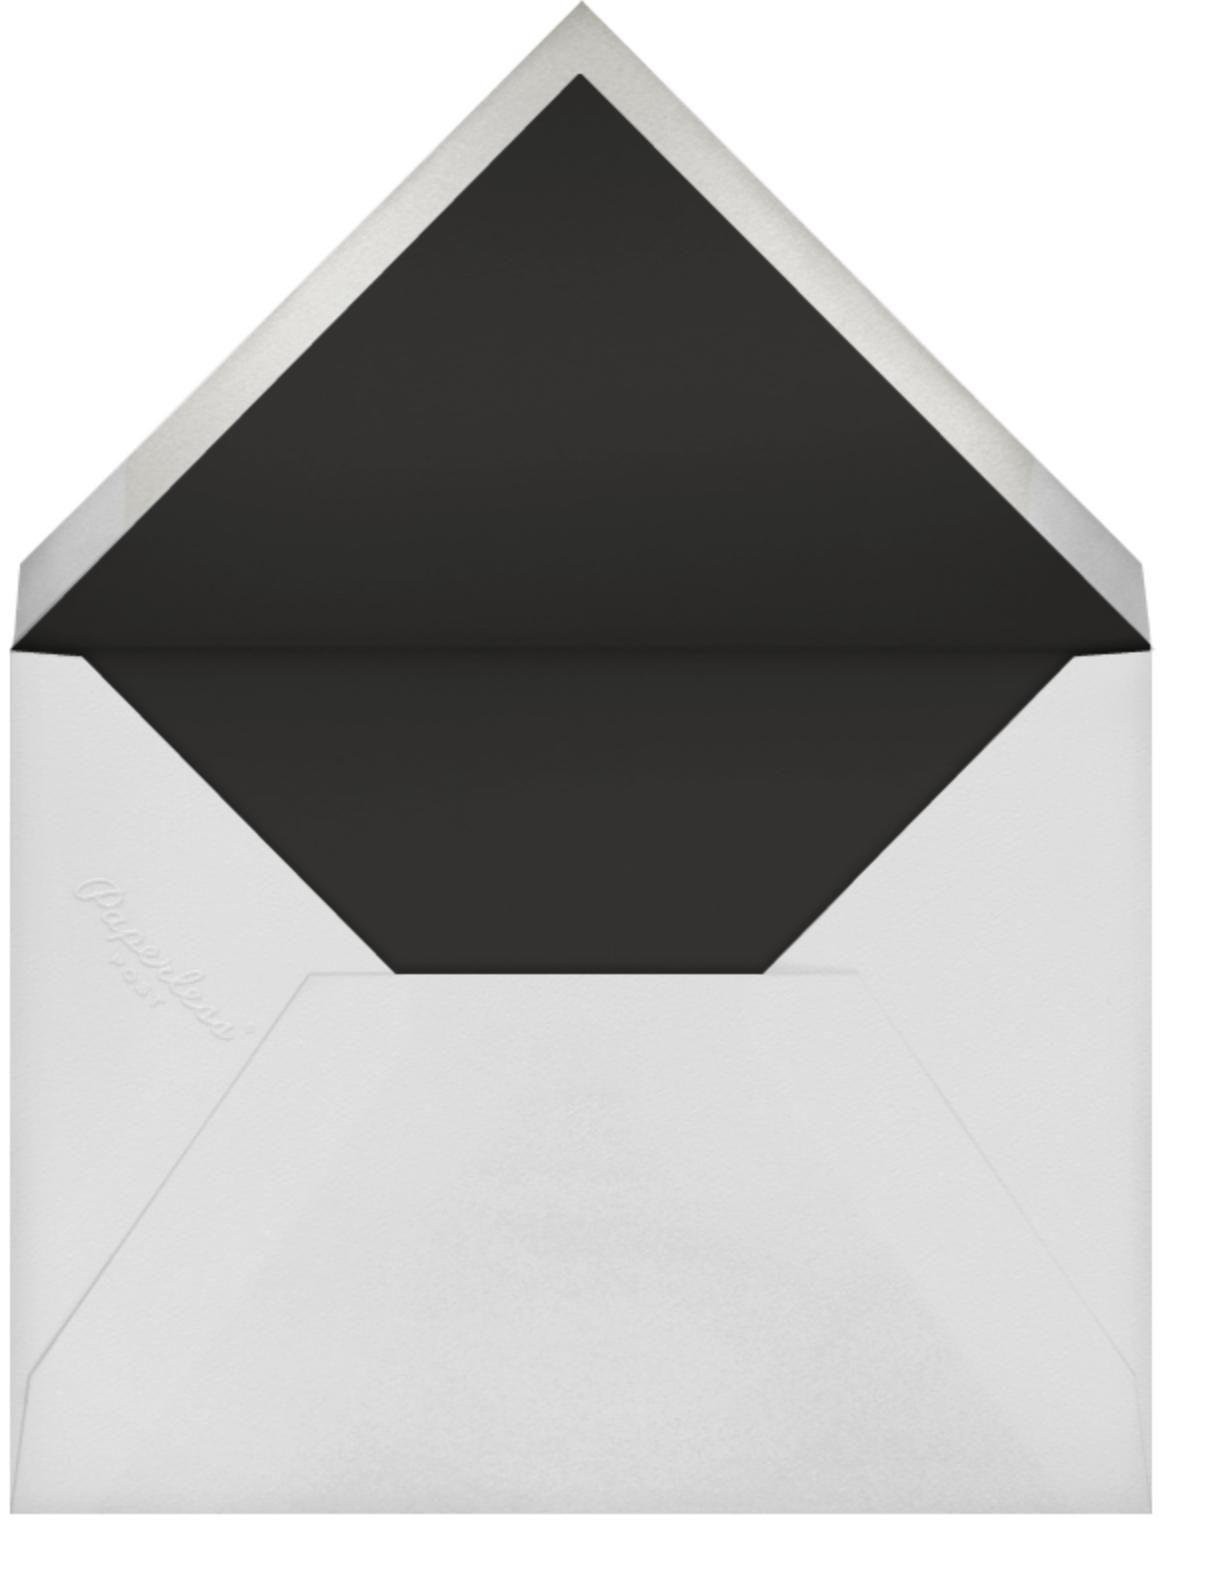 La Pavillion II (Invitation) - Cornflower - kate spade new york - All - envelope back